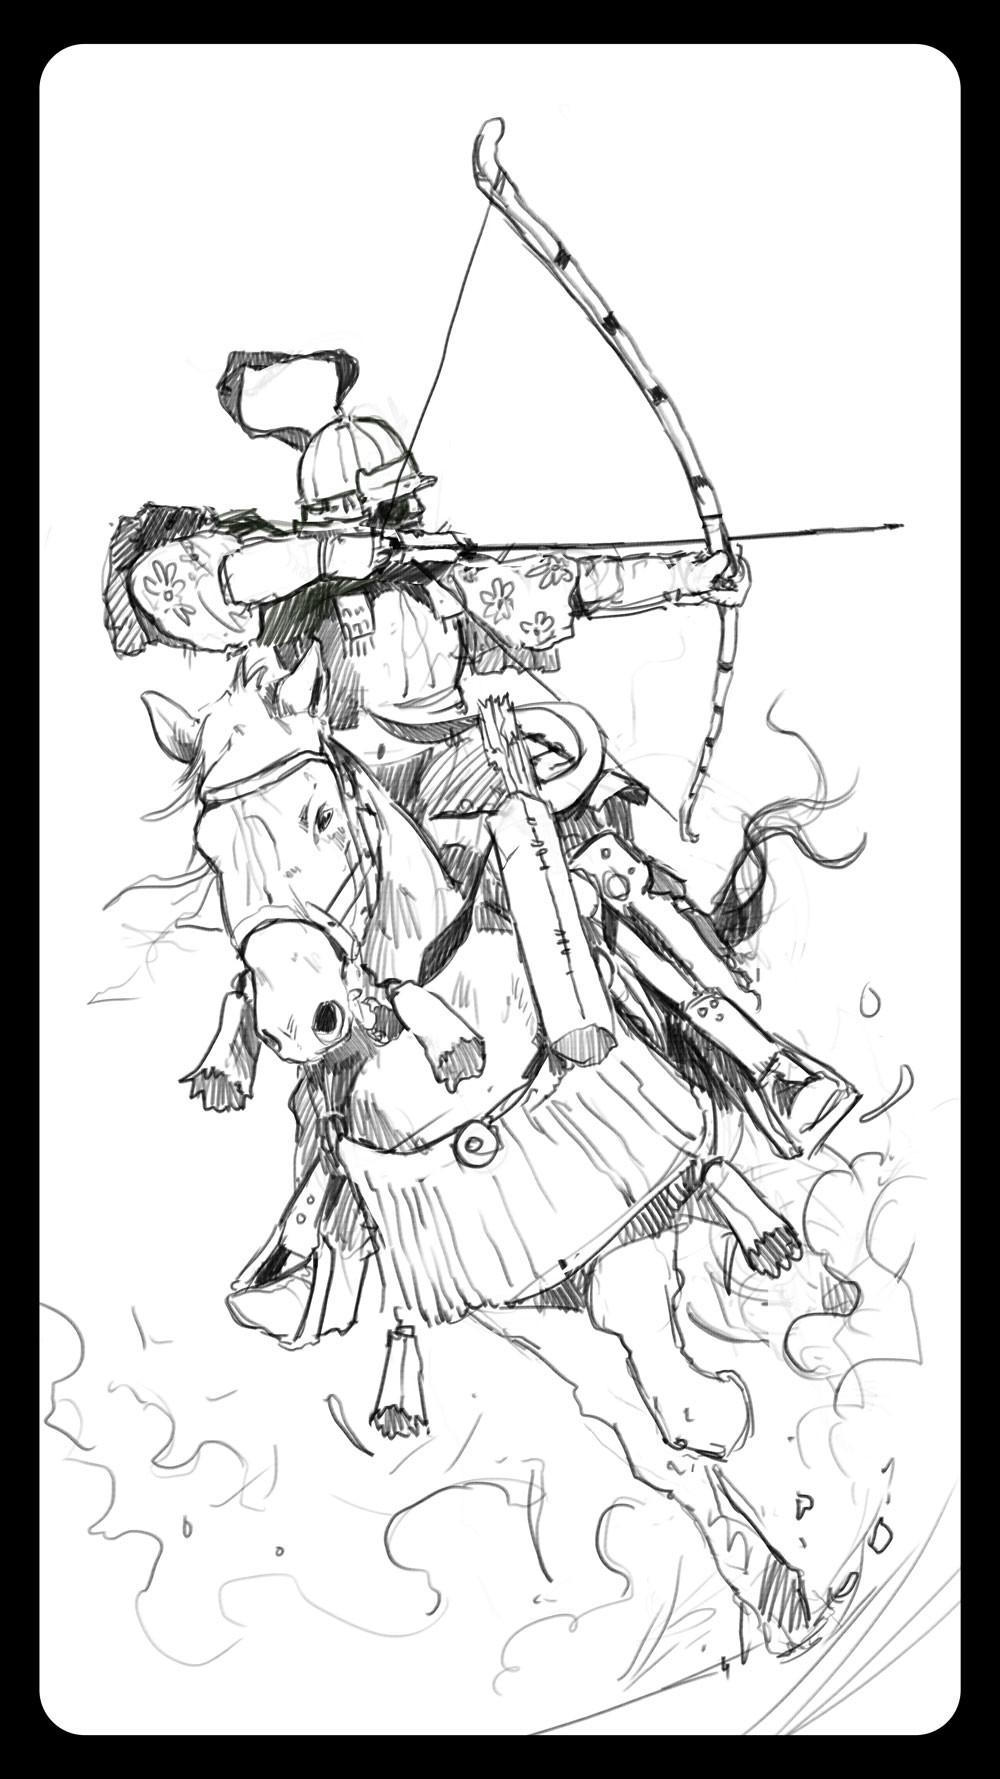 Dominik mayer samurai archer front sketch 01